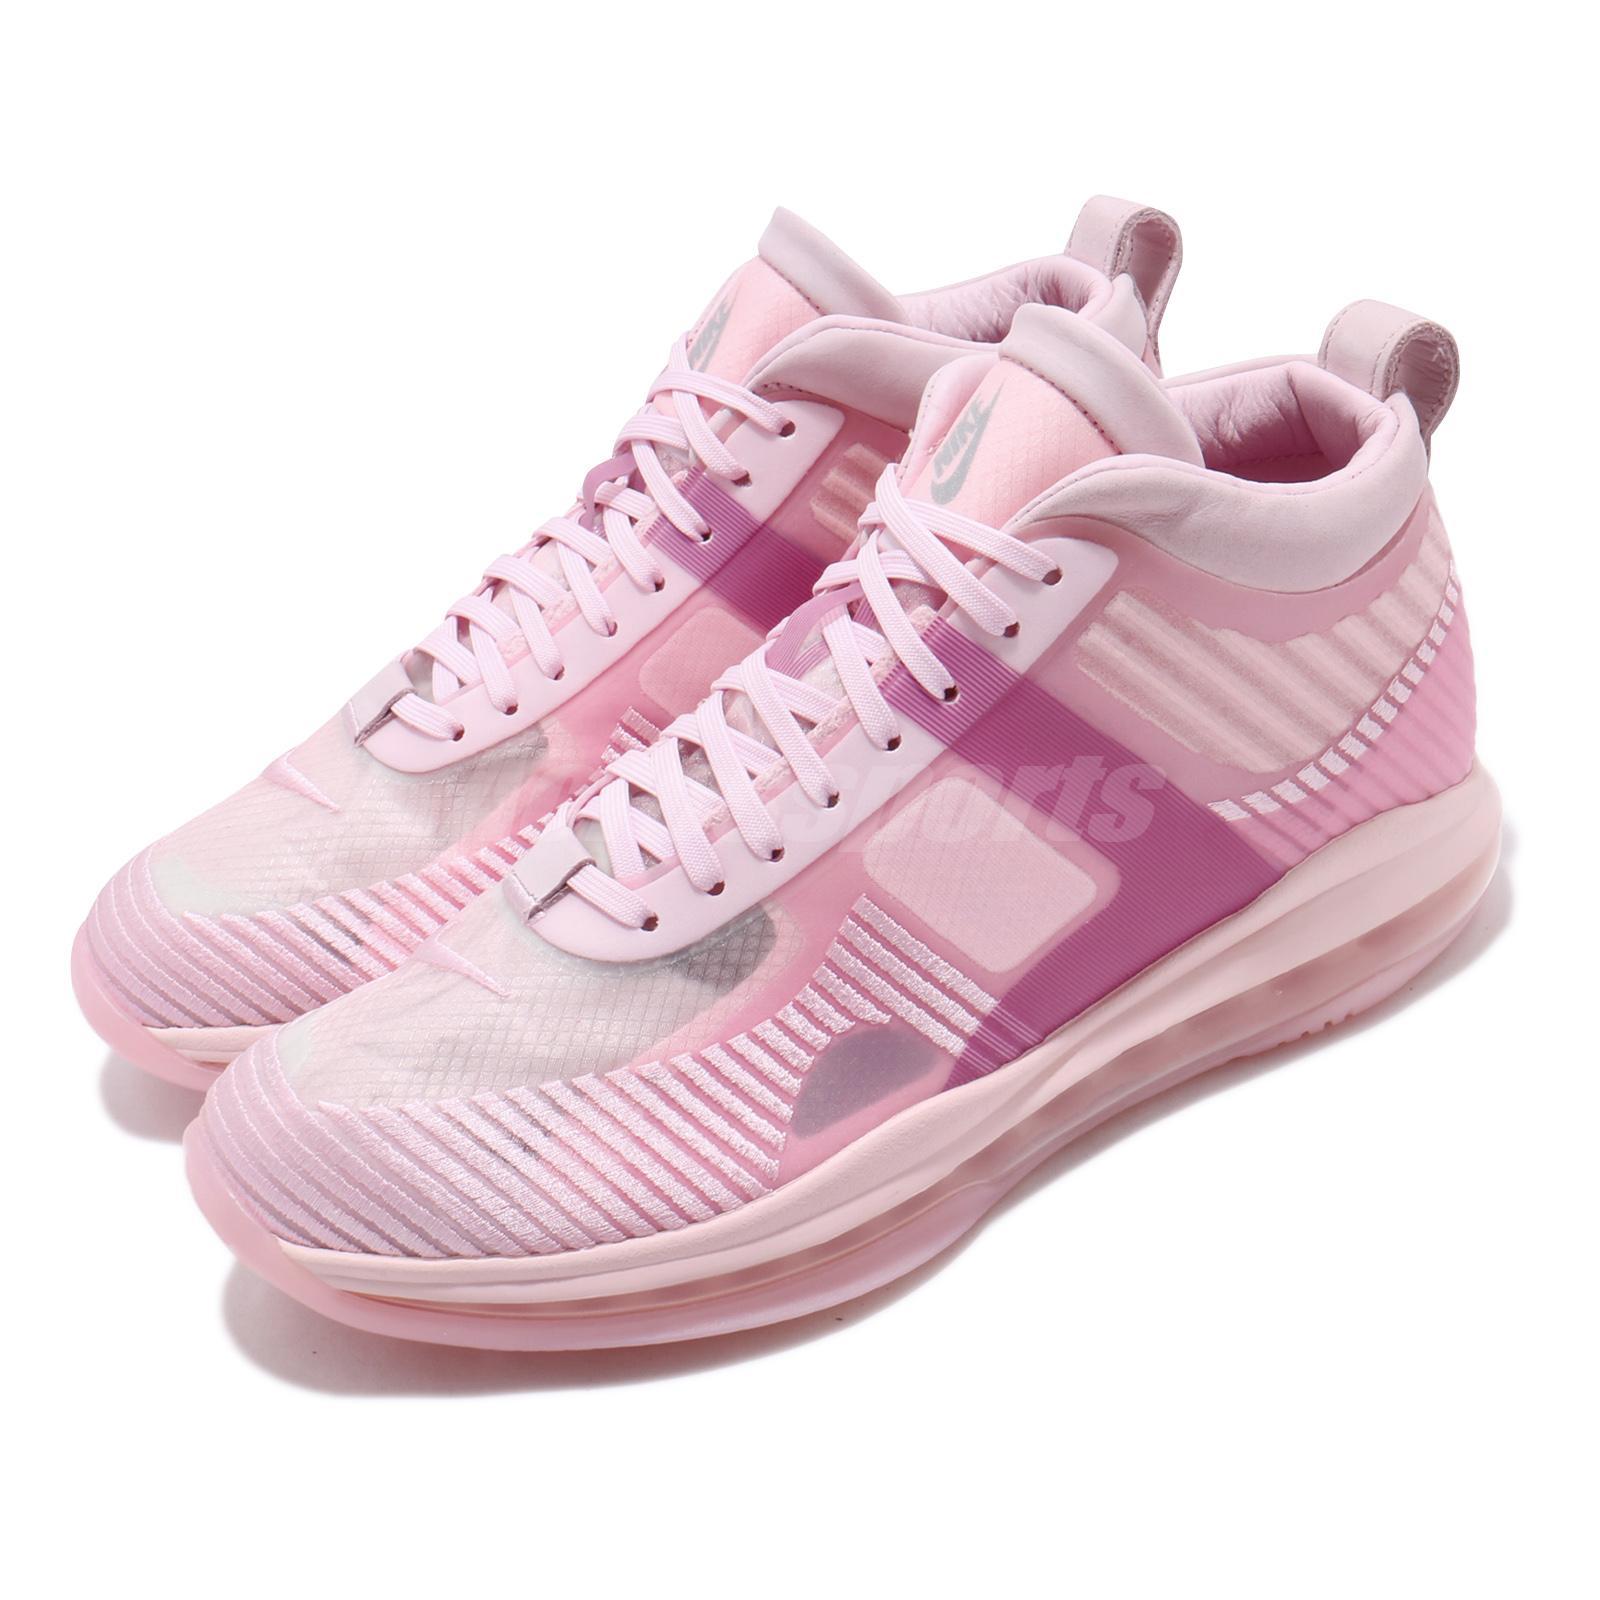 Nike LeBron X JE Icon QS James LBJ John